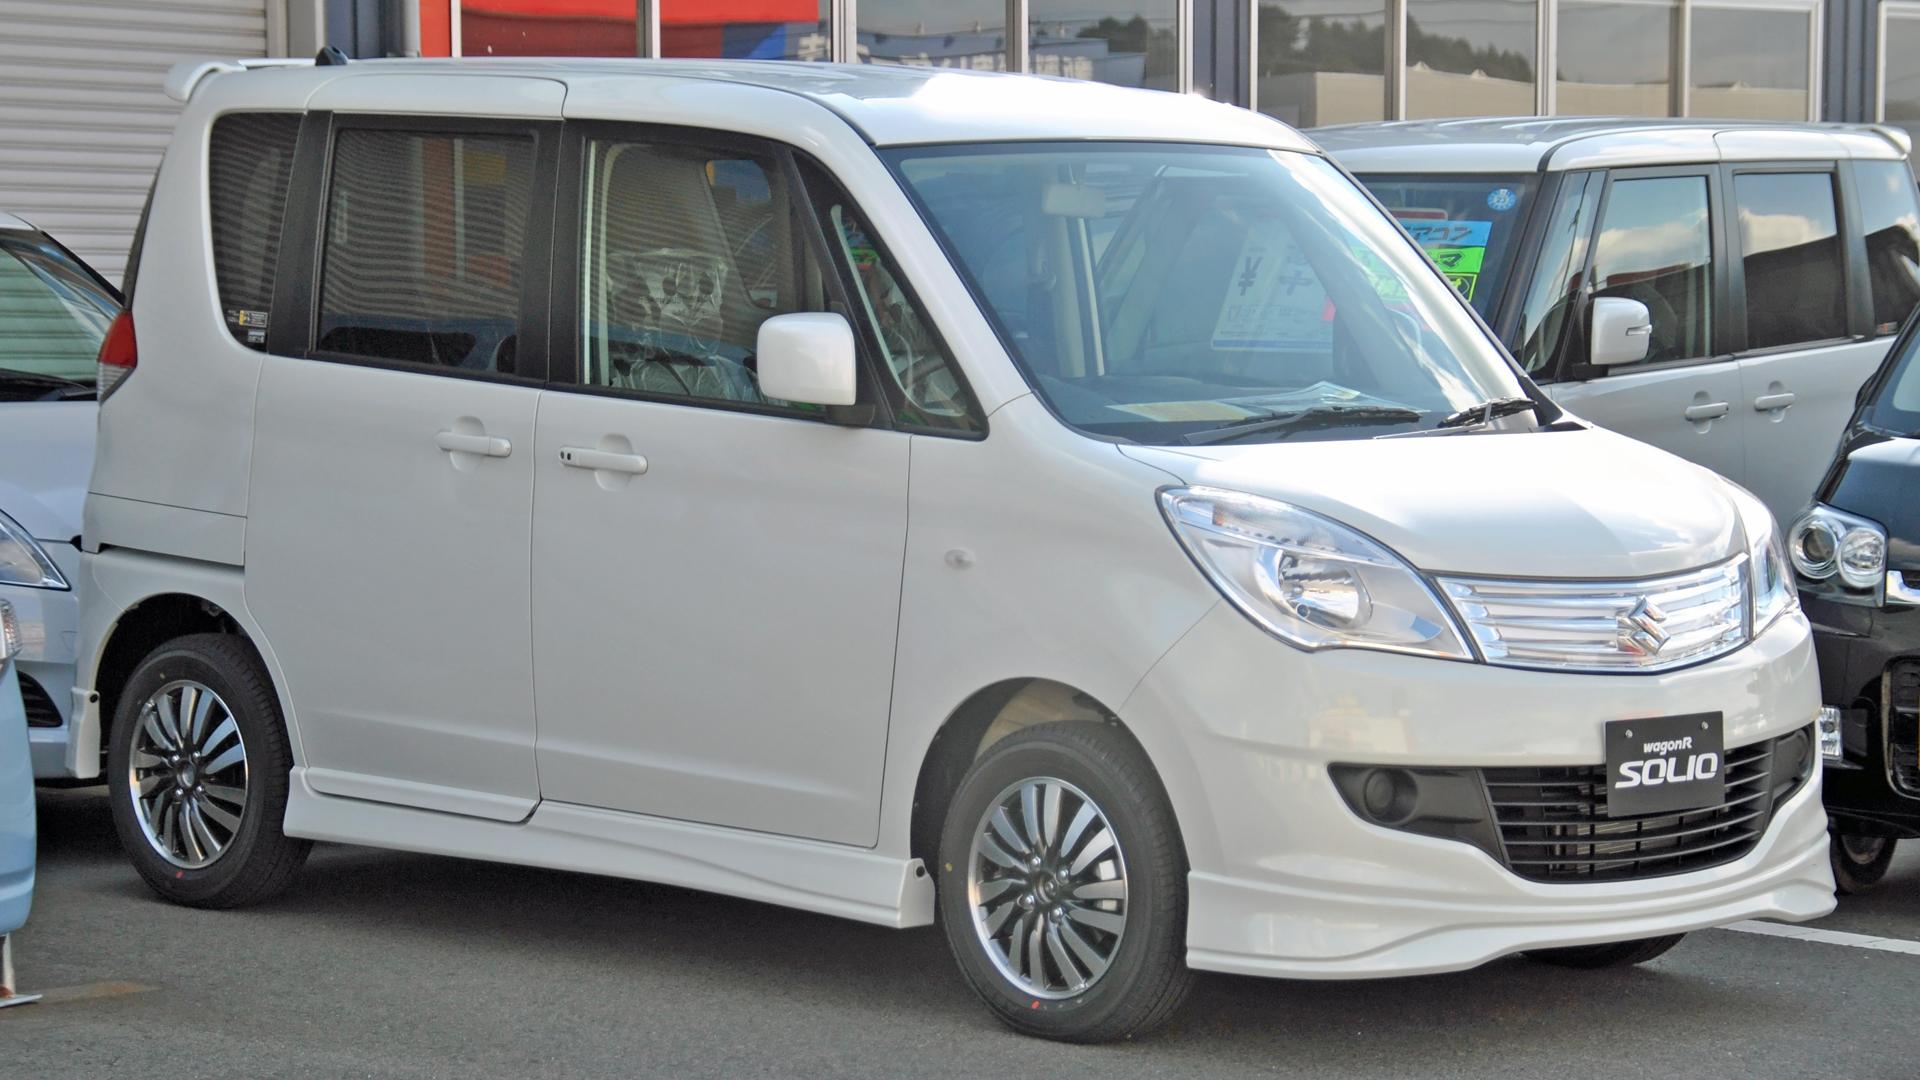 Suzuki MR Wagon III 2011 - 2016 Microvan #1